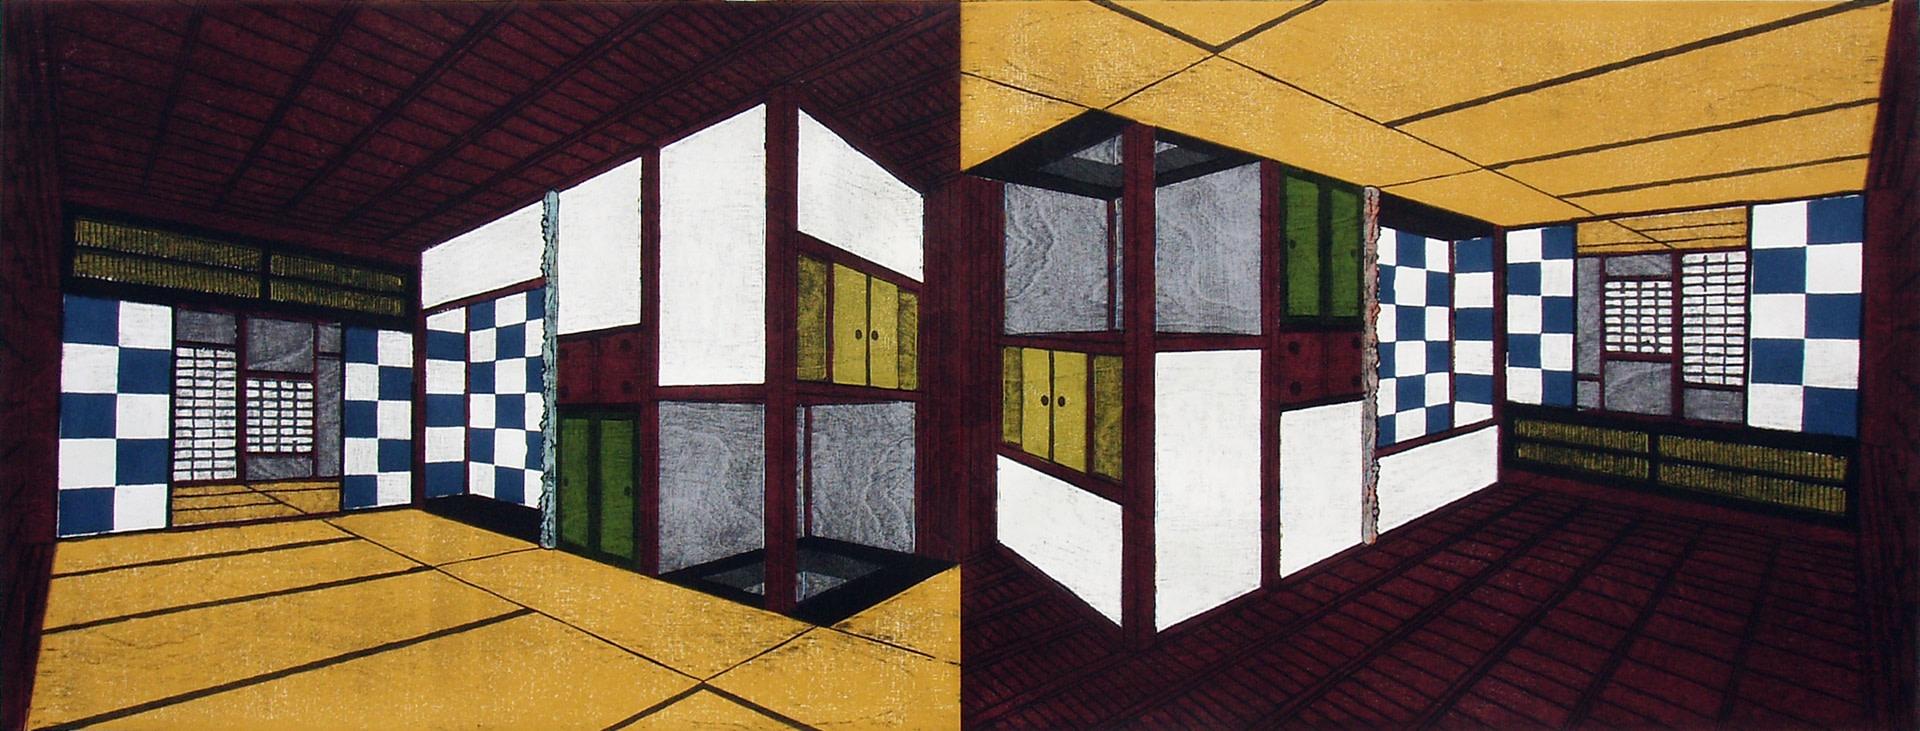 <span class=&#34;link fancybox-details-link&#34;><a href=&#34;/artists/114-nana-shiomi-re/works/9518/&#34;>View Detail Page</a></span><div class=&#34;artist&#34;><span class=&#34;artist&#34;><strong>Nana Shiomi RE</strong></span></div><div class=&#34;title&#34;><em>Reverse Universe - Ichimatsu</em></div><div class=&#34;medium&#34;>woodcut</div>